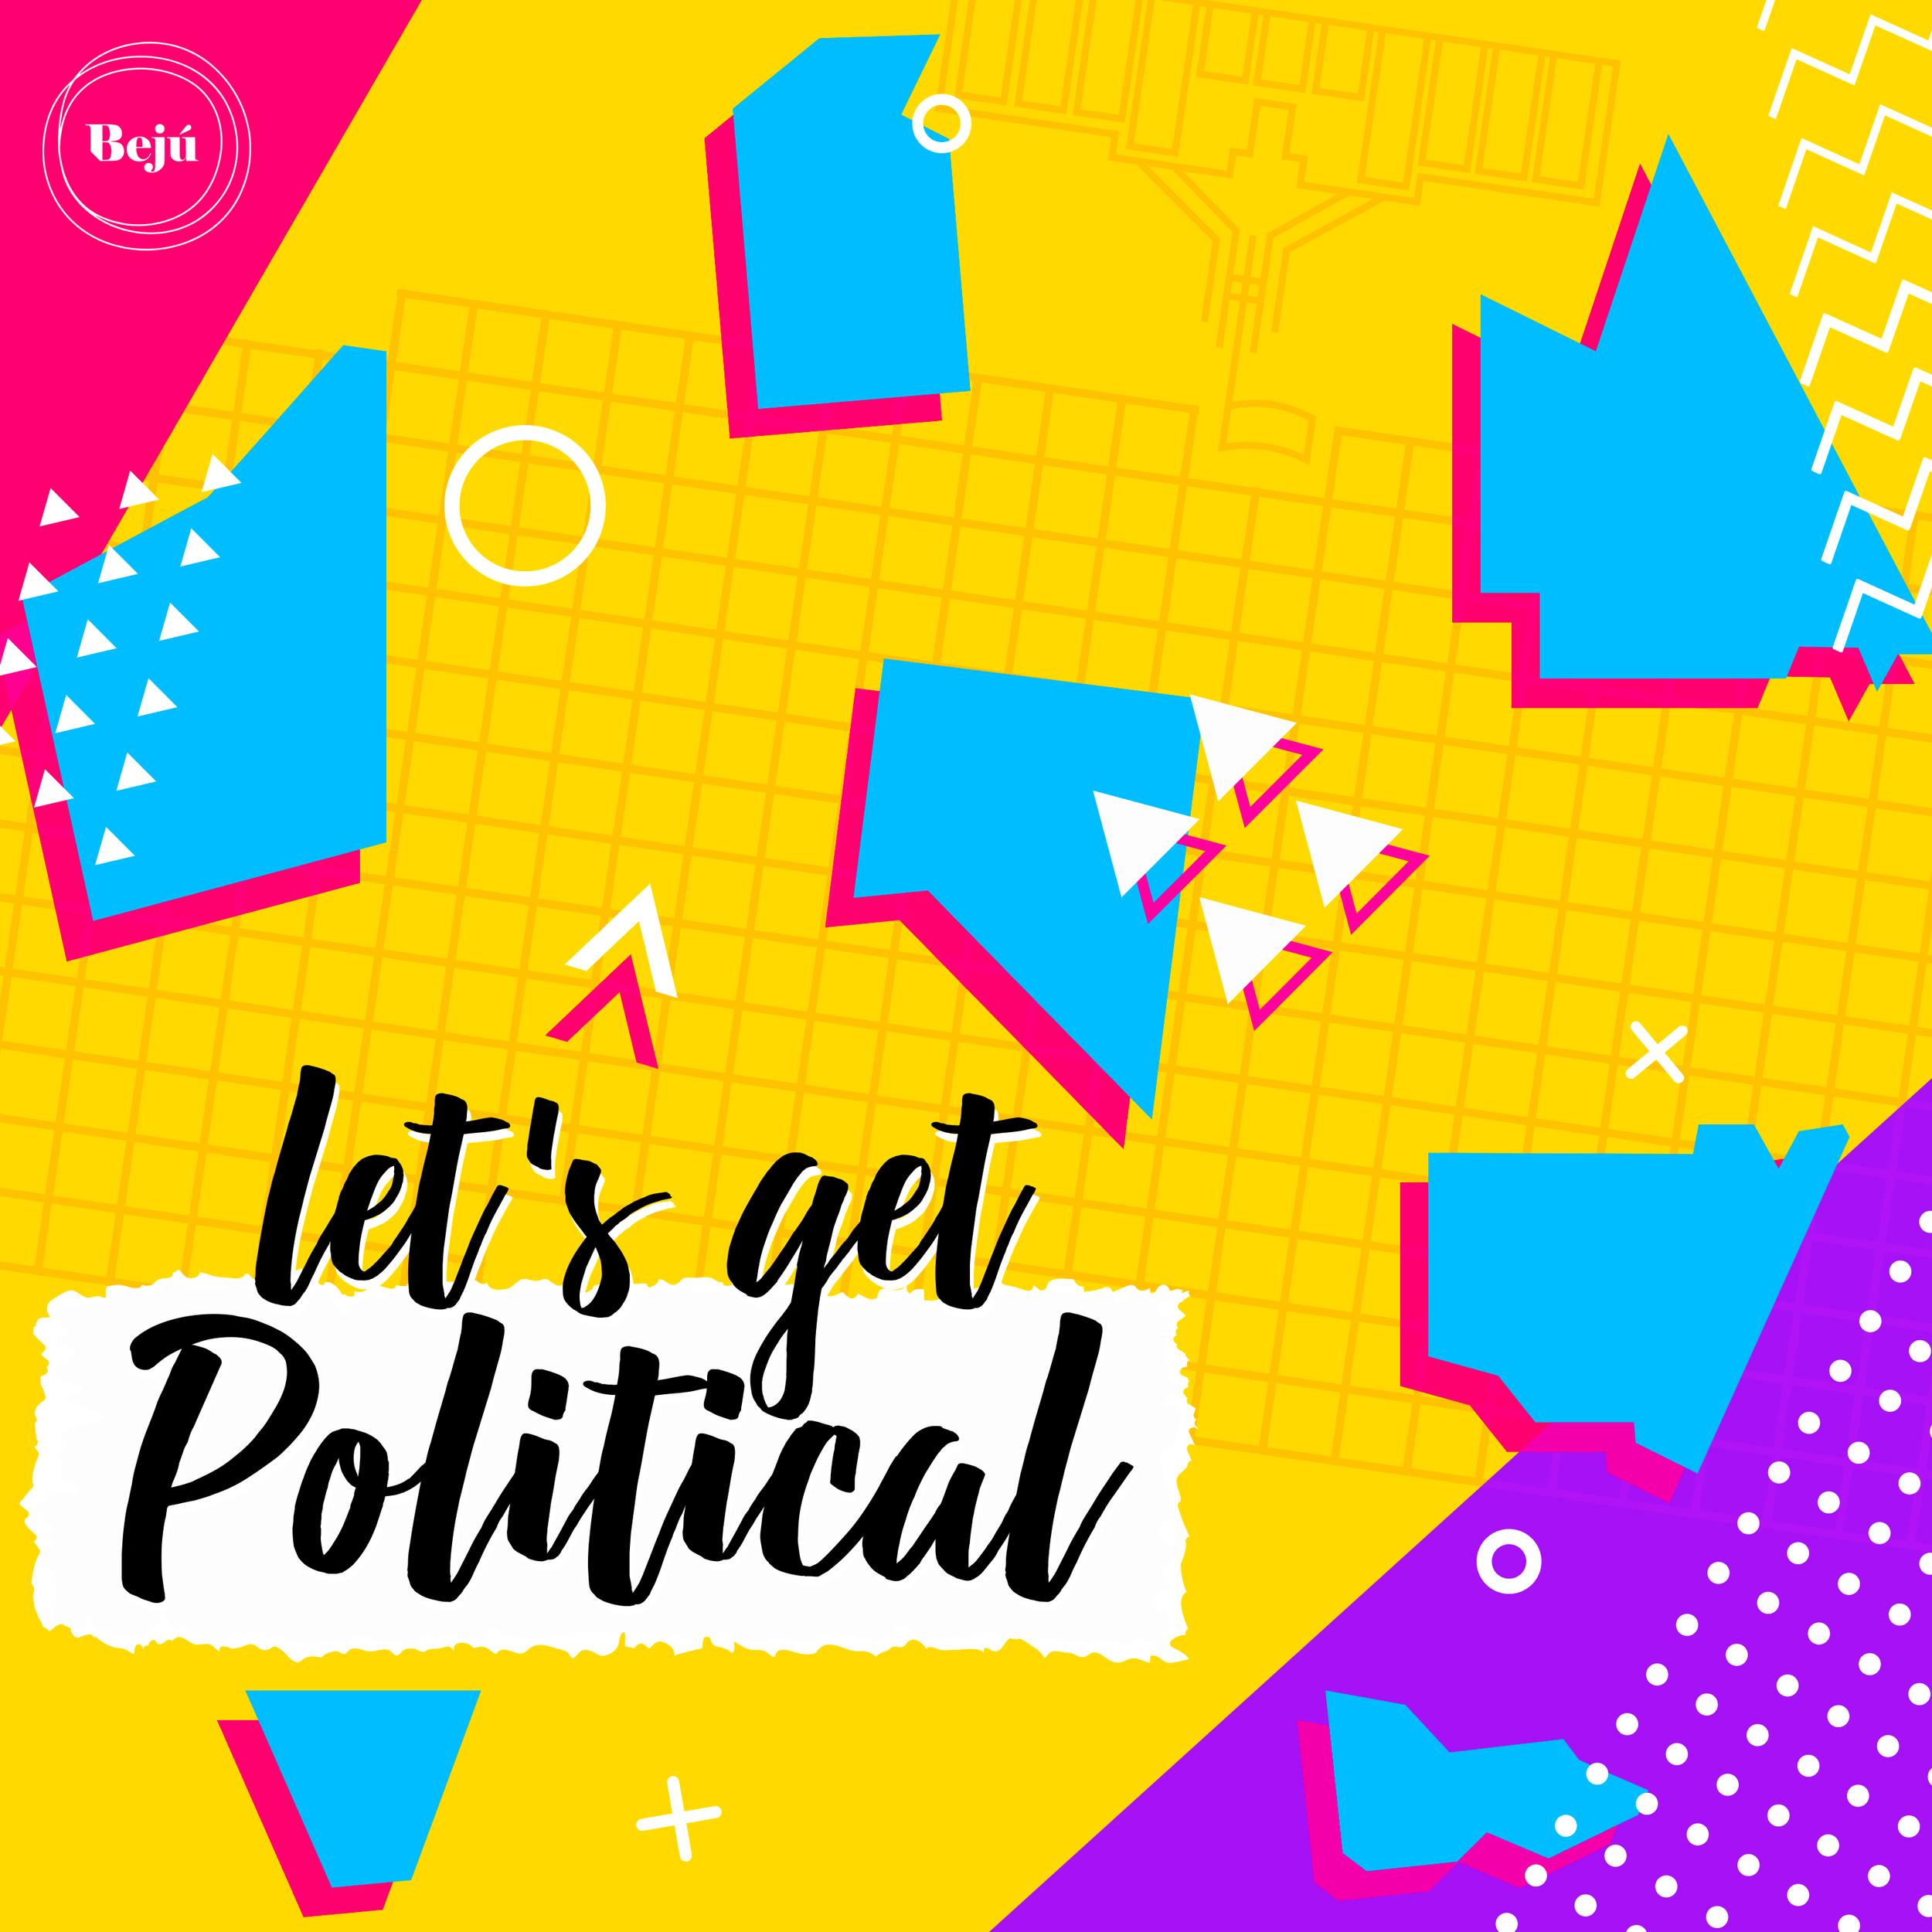 LetsGetPolitical_Square_LARGE.png